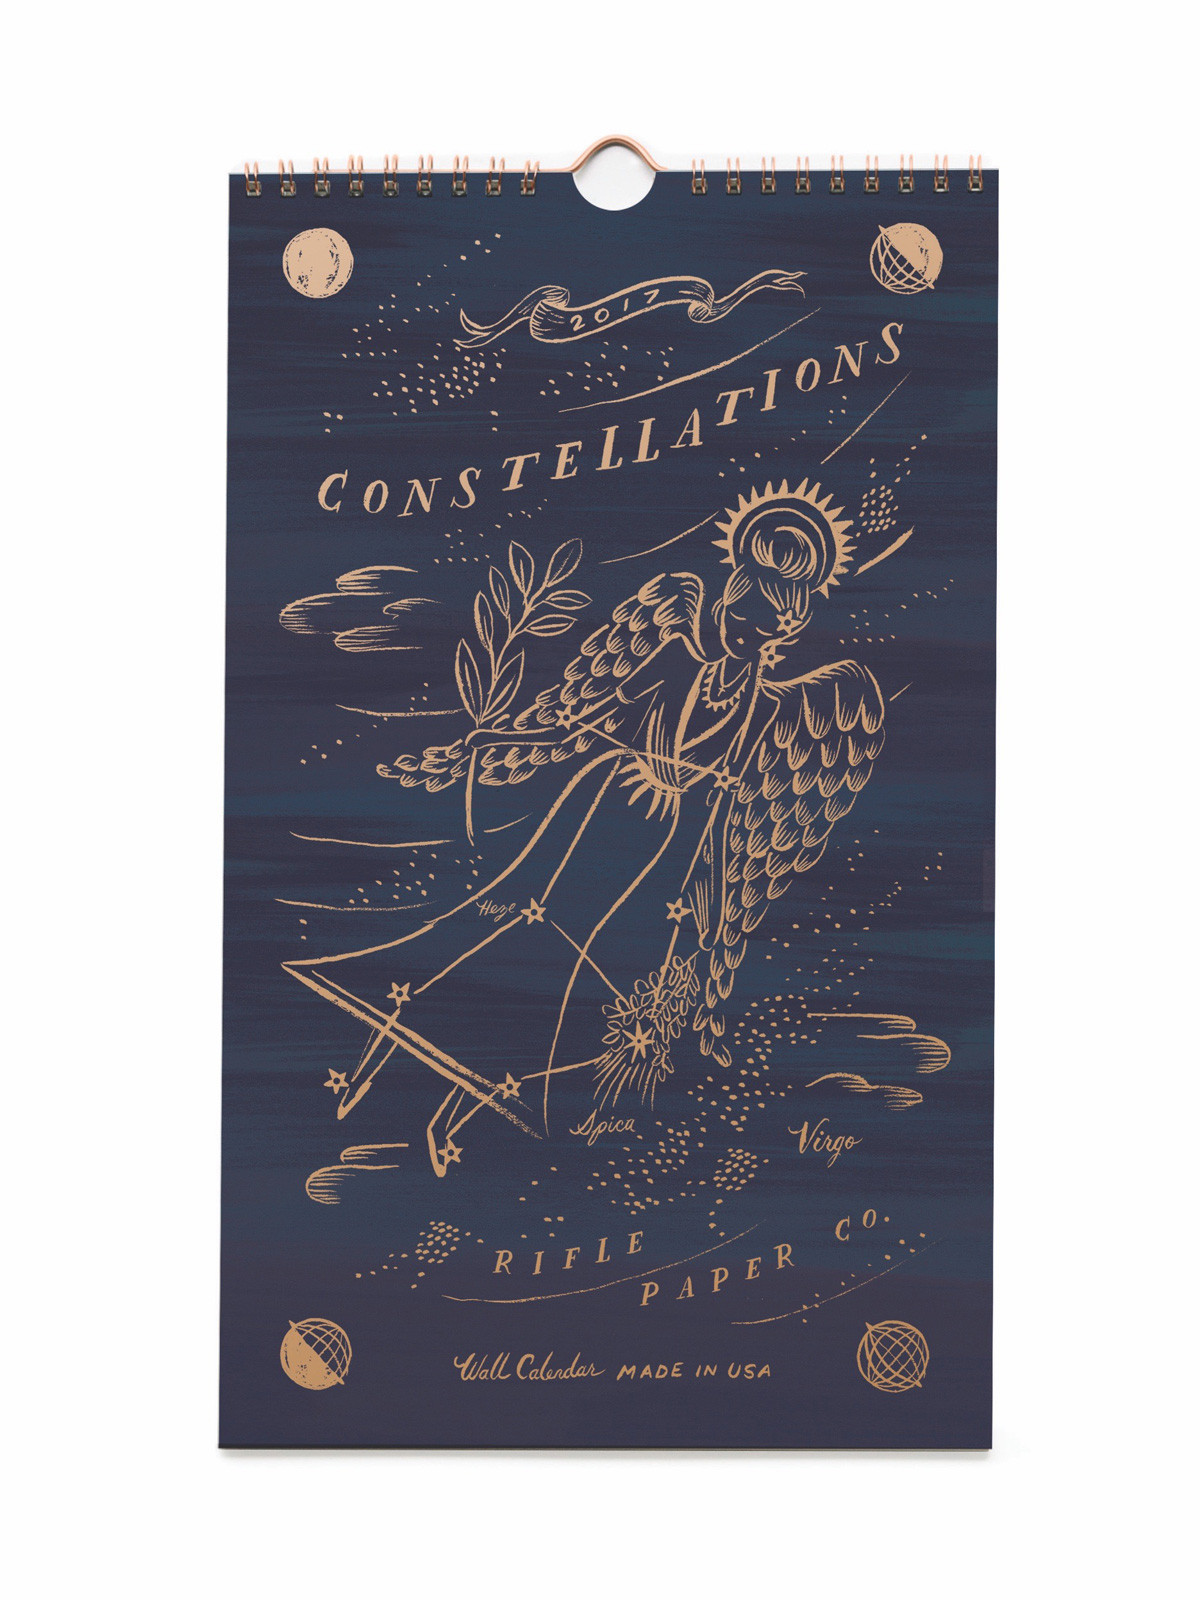 Rifle-Paper-Co-2017-Constellations-calendar.jpg